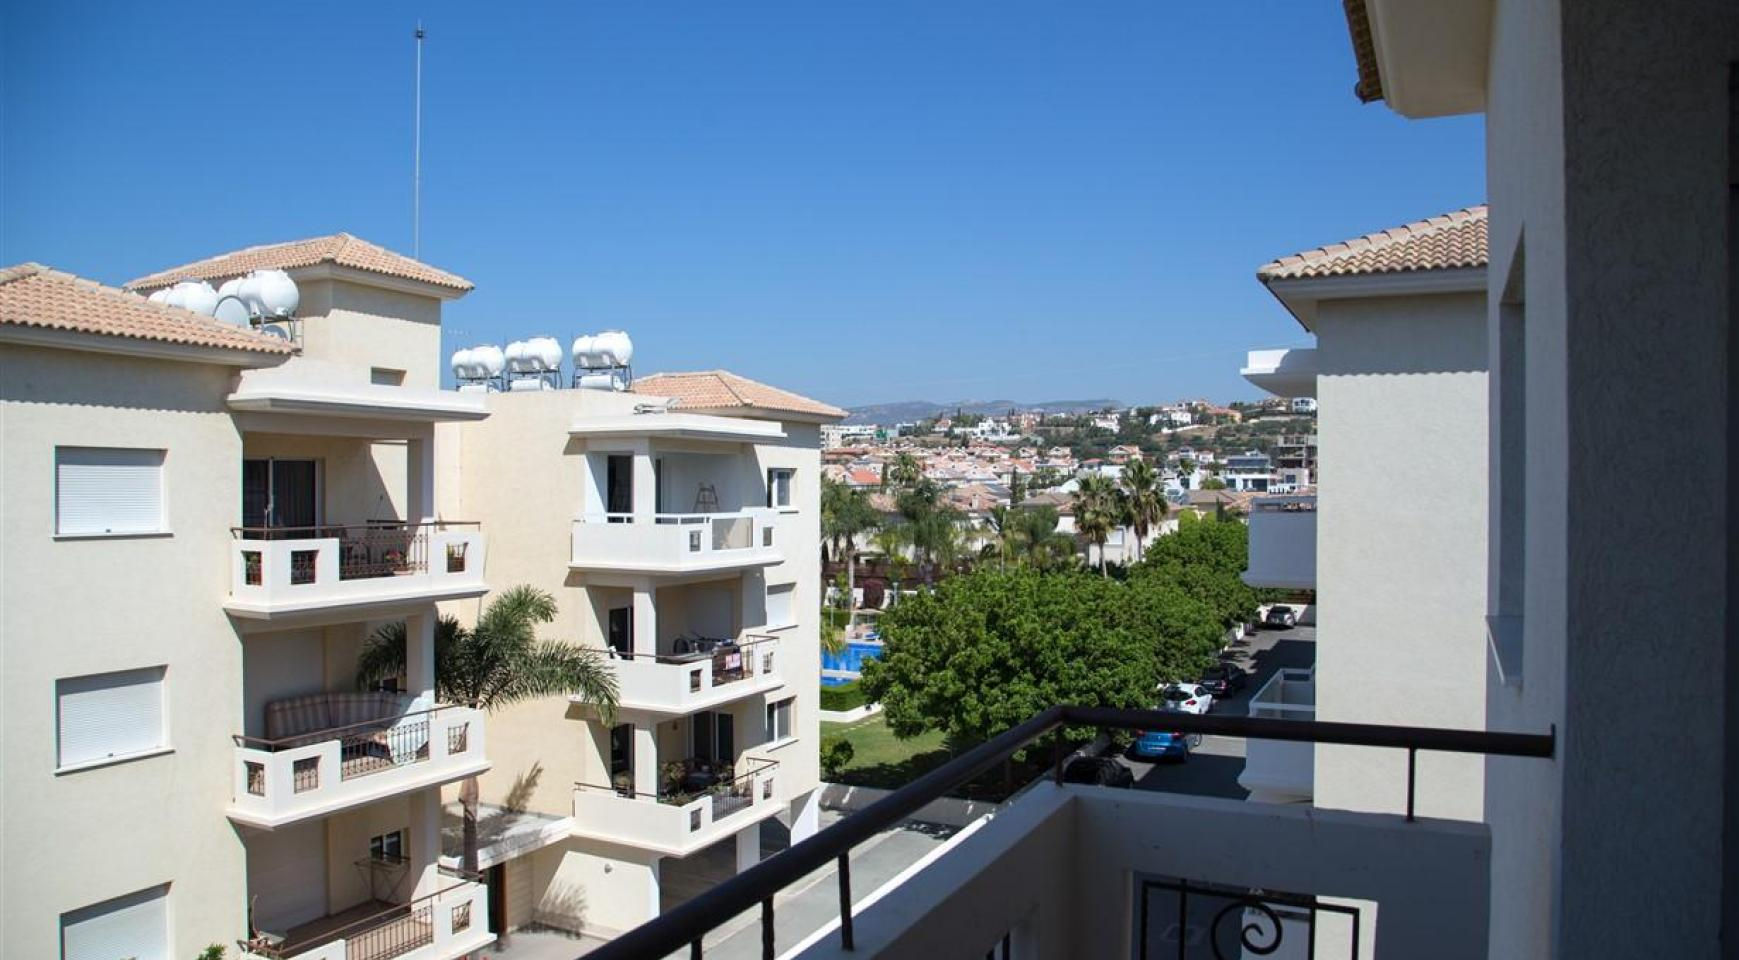 Luxury 2 Bedroom Apartment Mesogios Iris 304 in the Tourist area near the Beach - 45